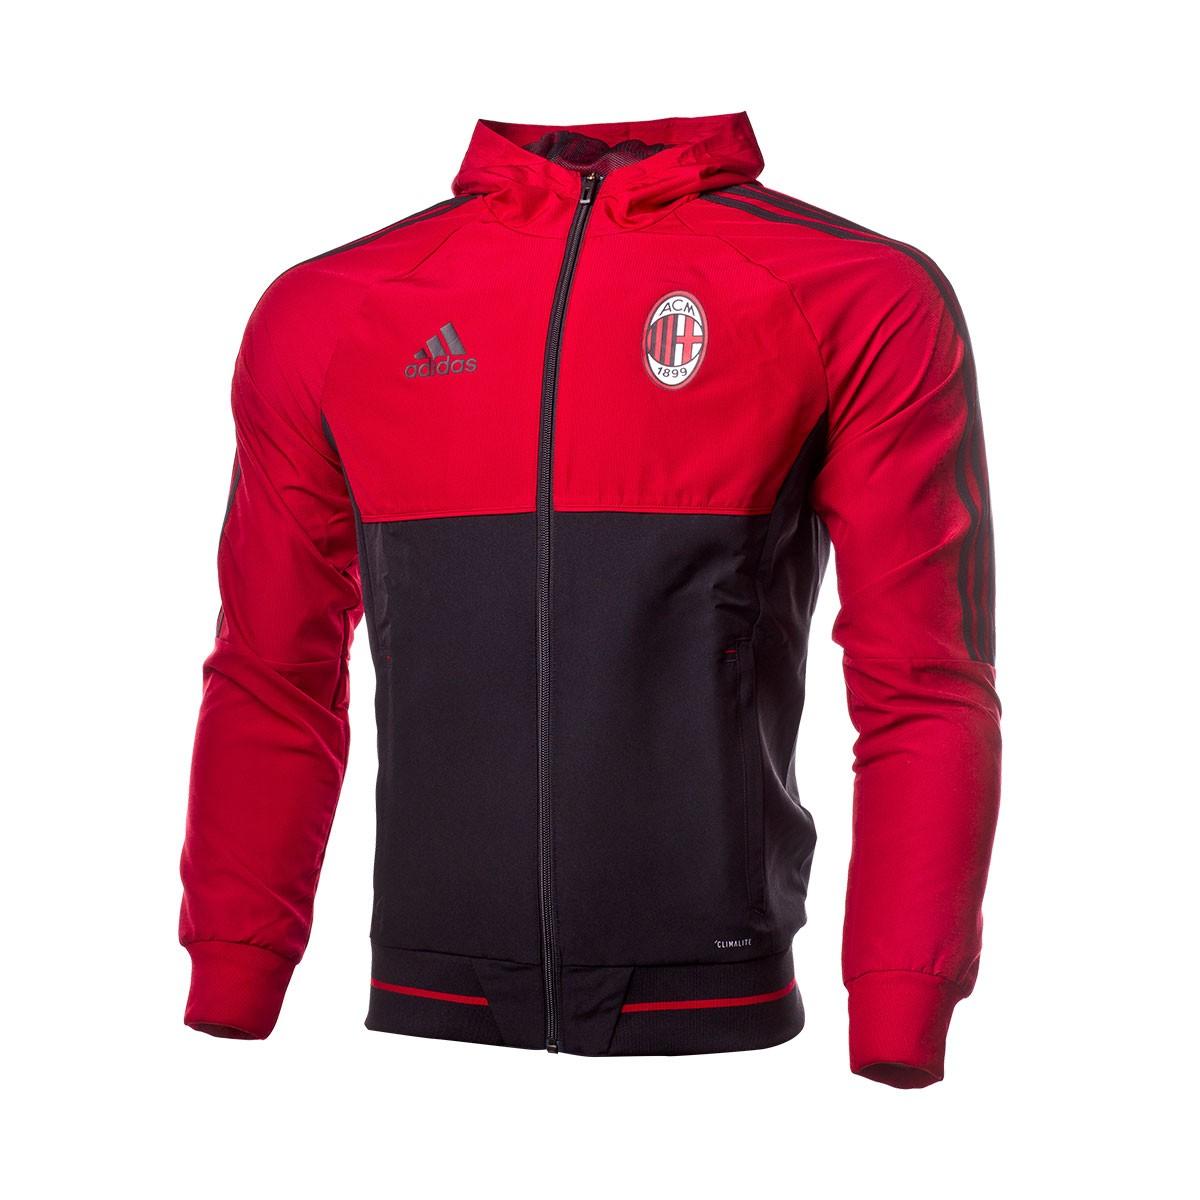 e739699953 Jacket adidas AC Milan Pre-Match 2017-2018 Victory red-Black ...